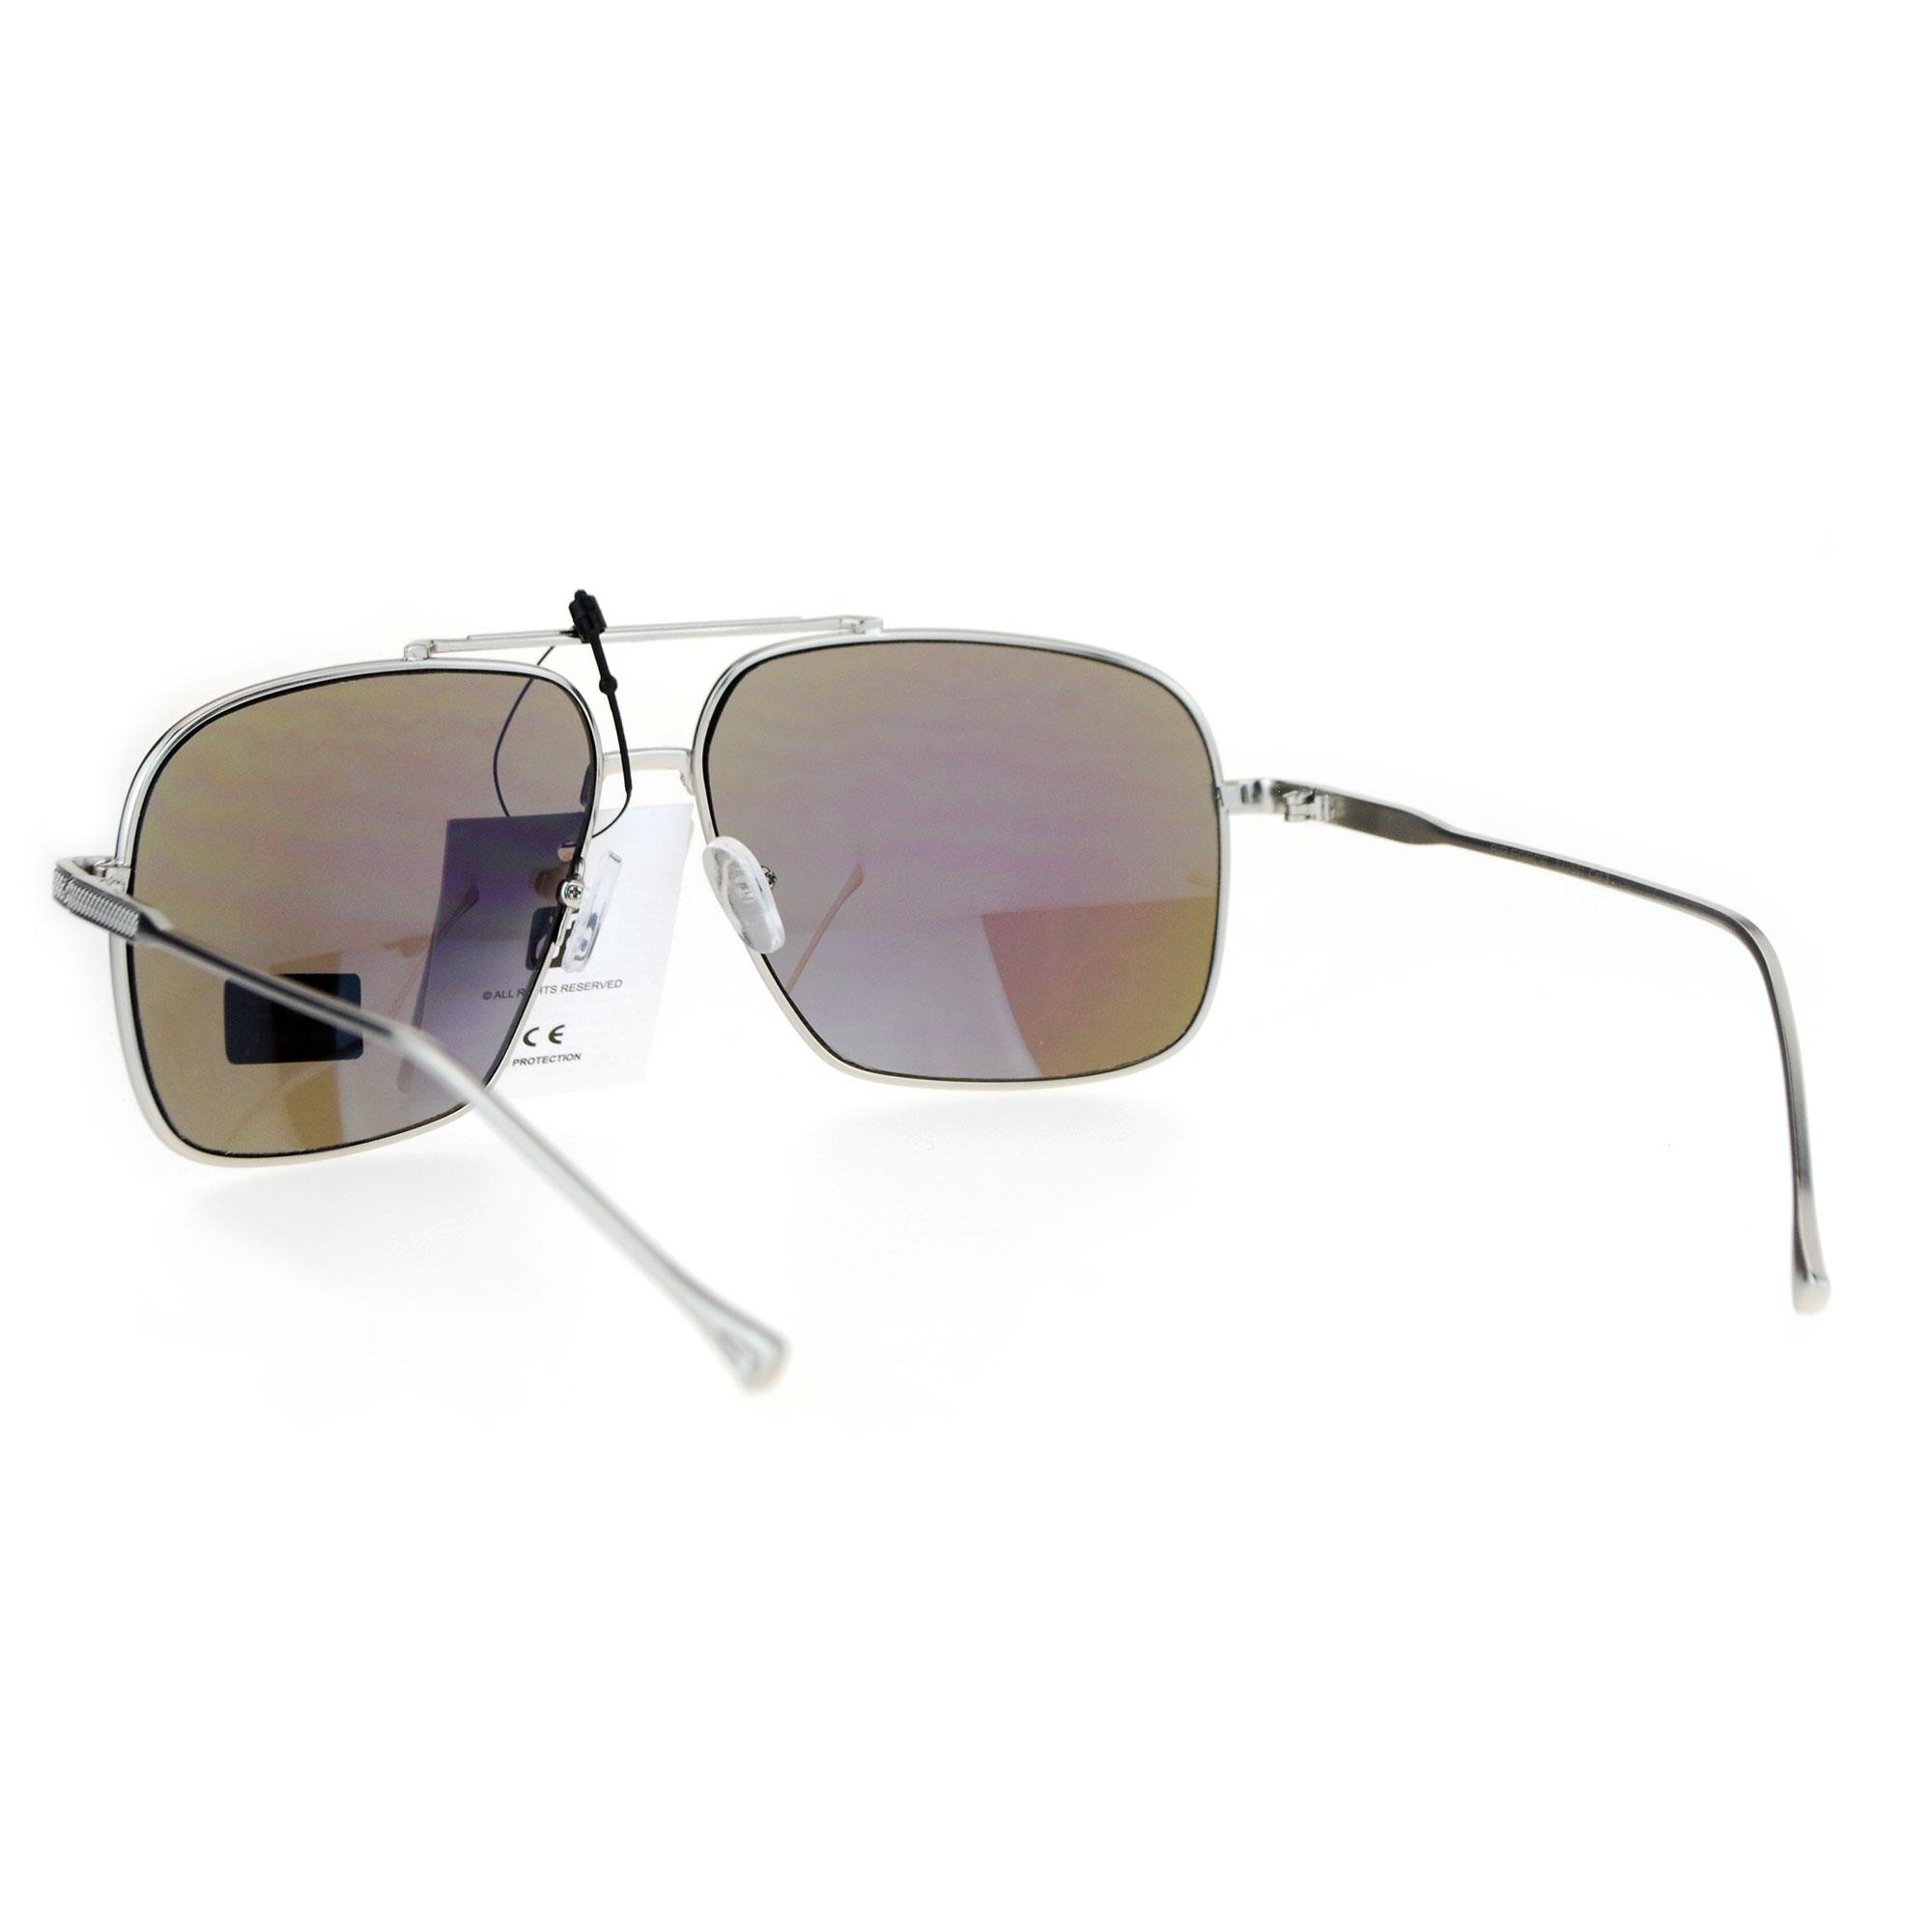 6909e08410d0 Mens Oversized Mirrored Aviator Sunglasses